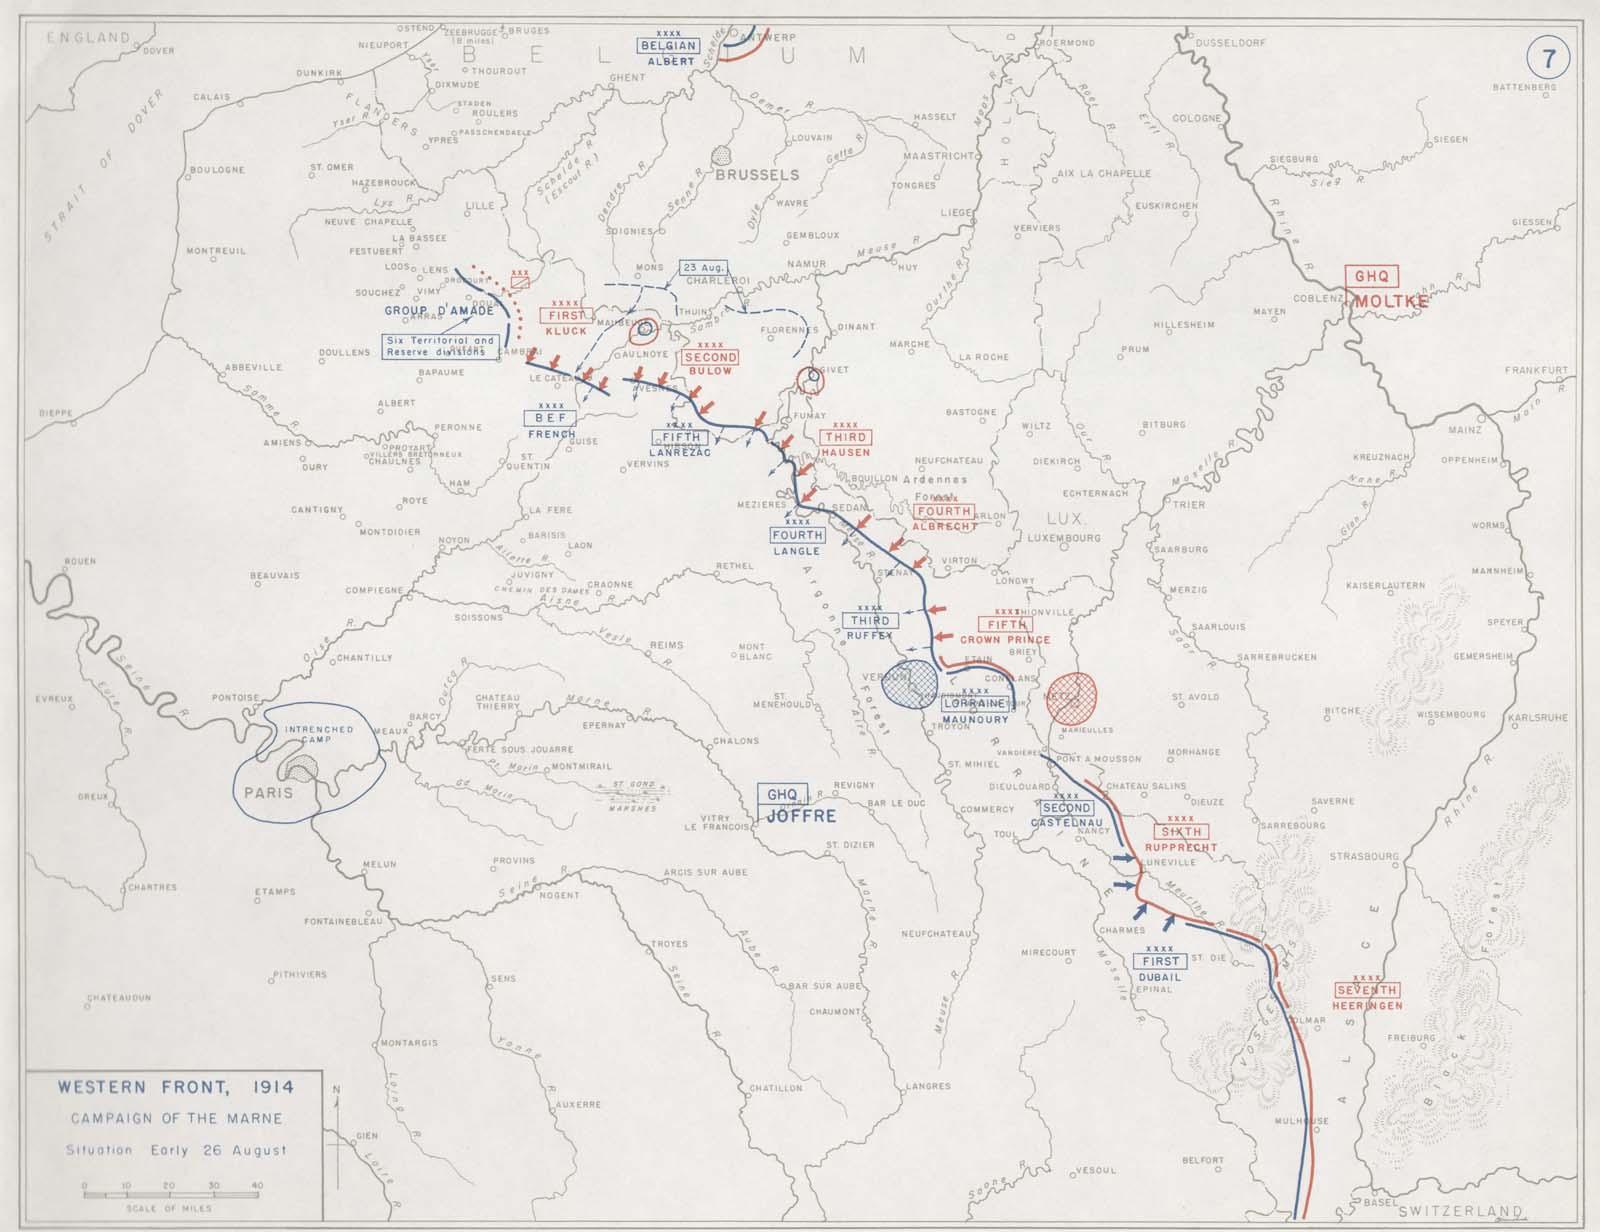 500 Ww1 World War One Military Map Photos Amp Book Battle